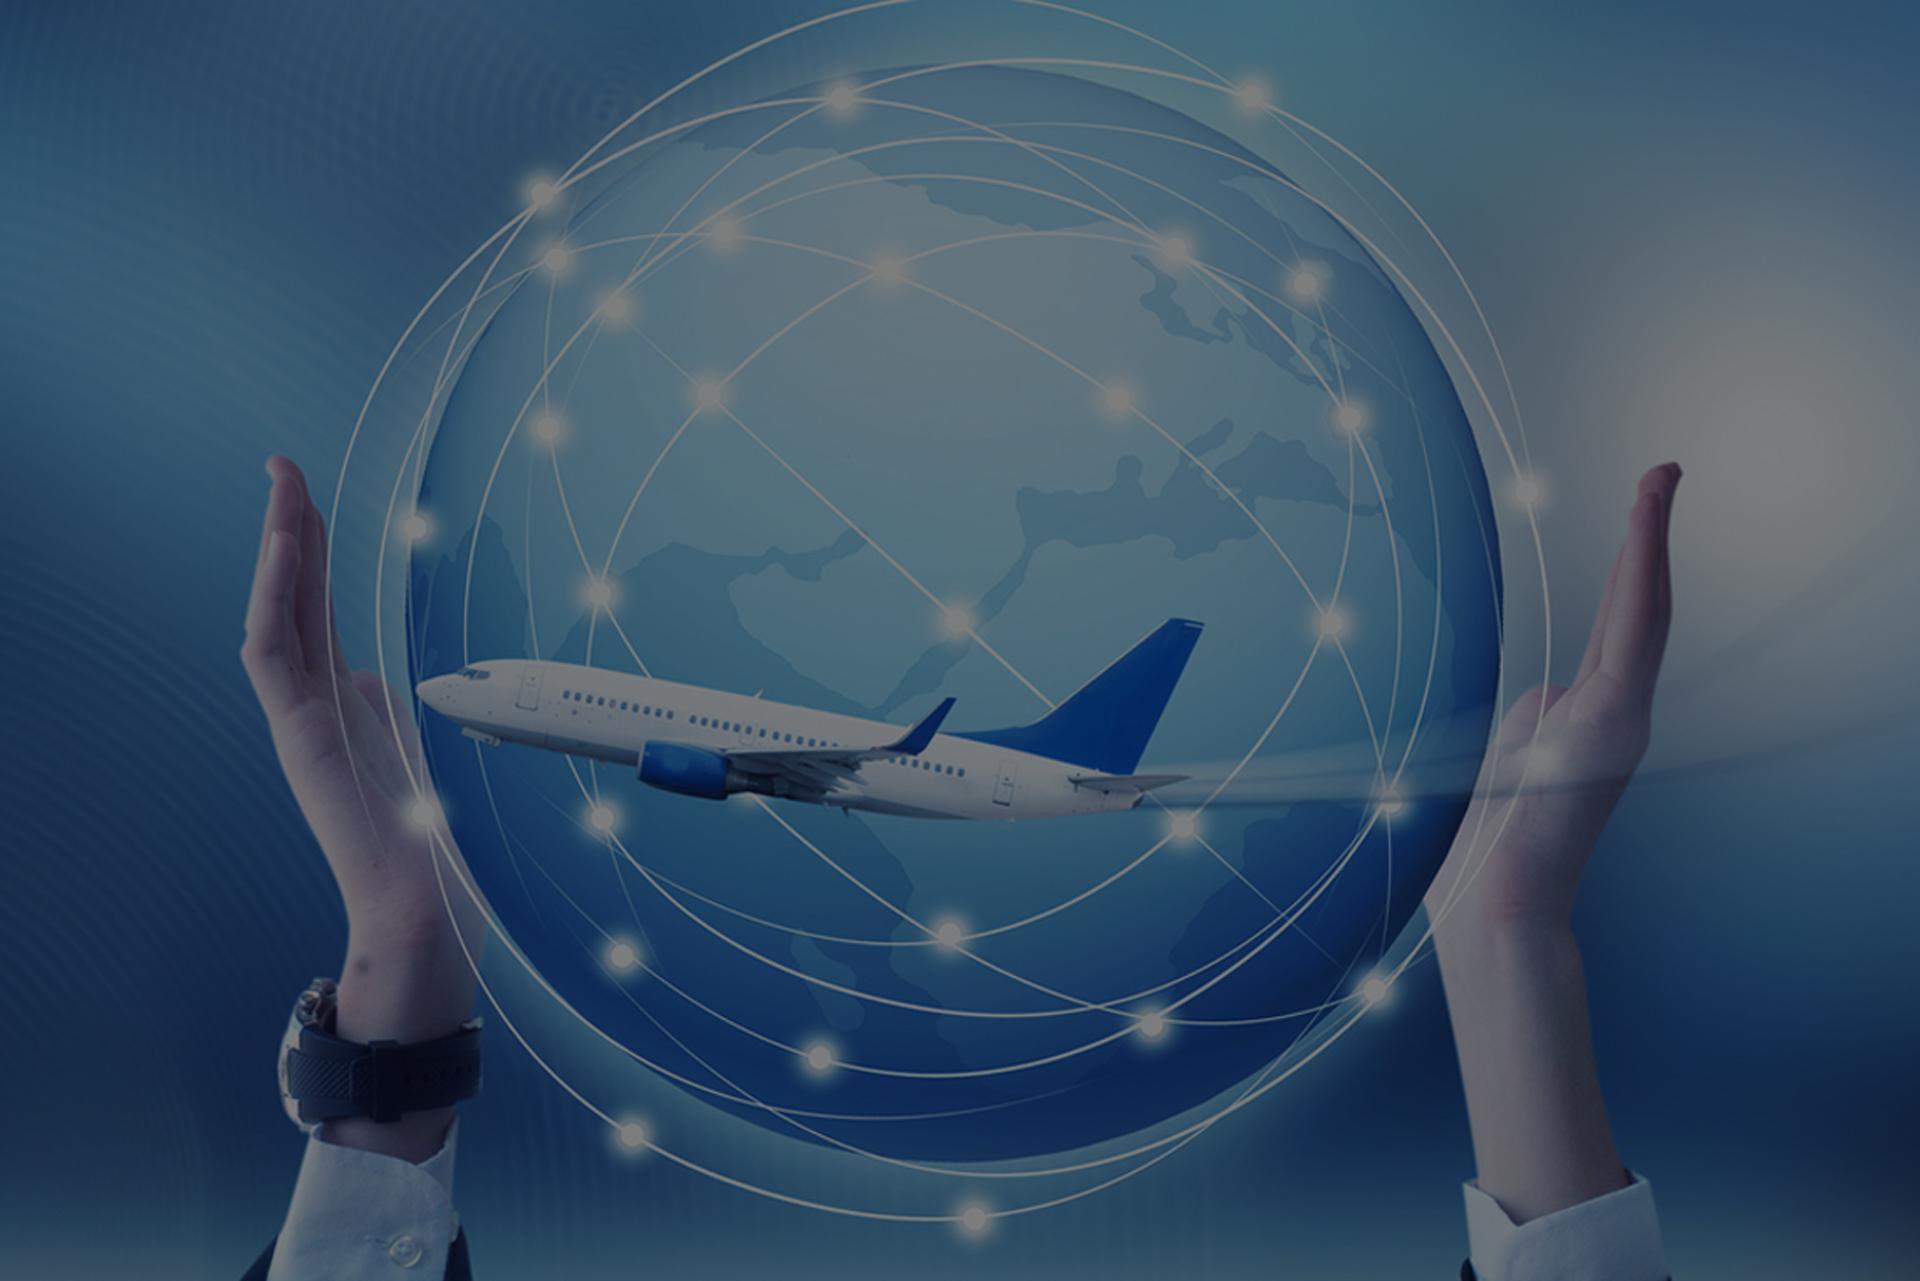 آژانس مسافرتی پروند سیر